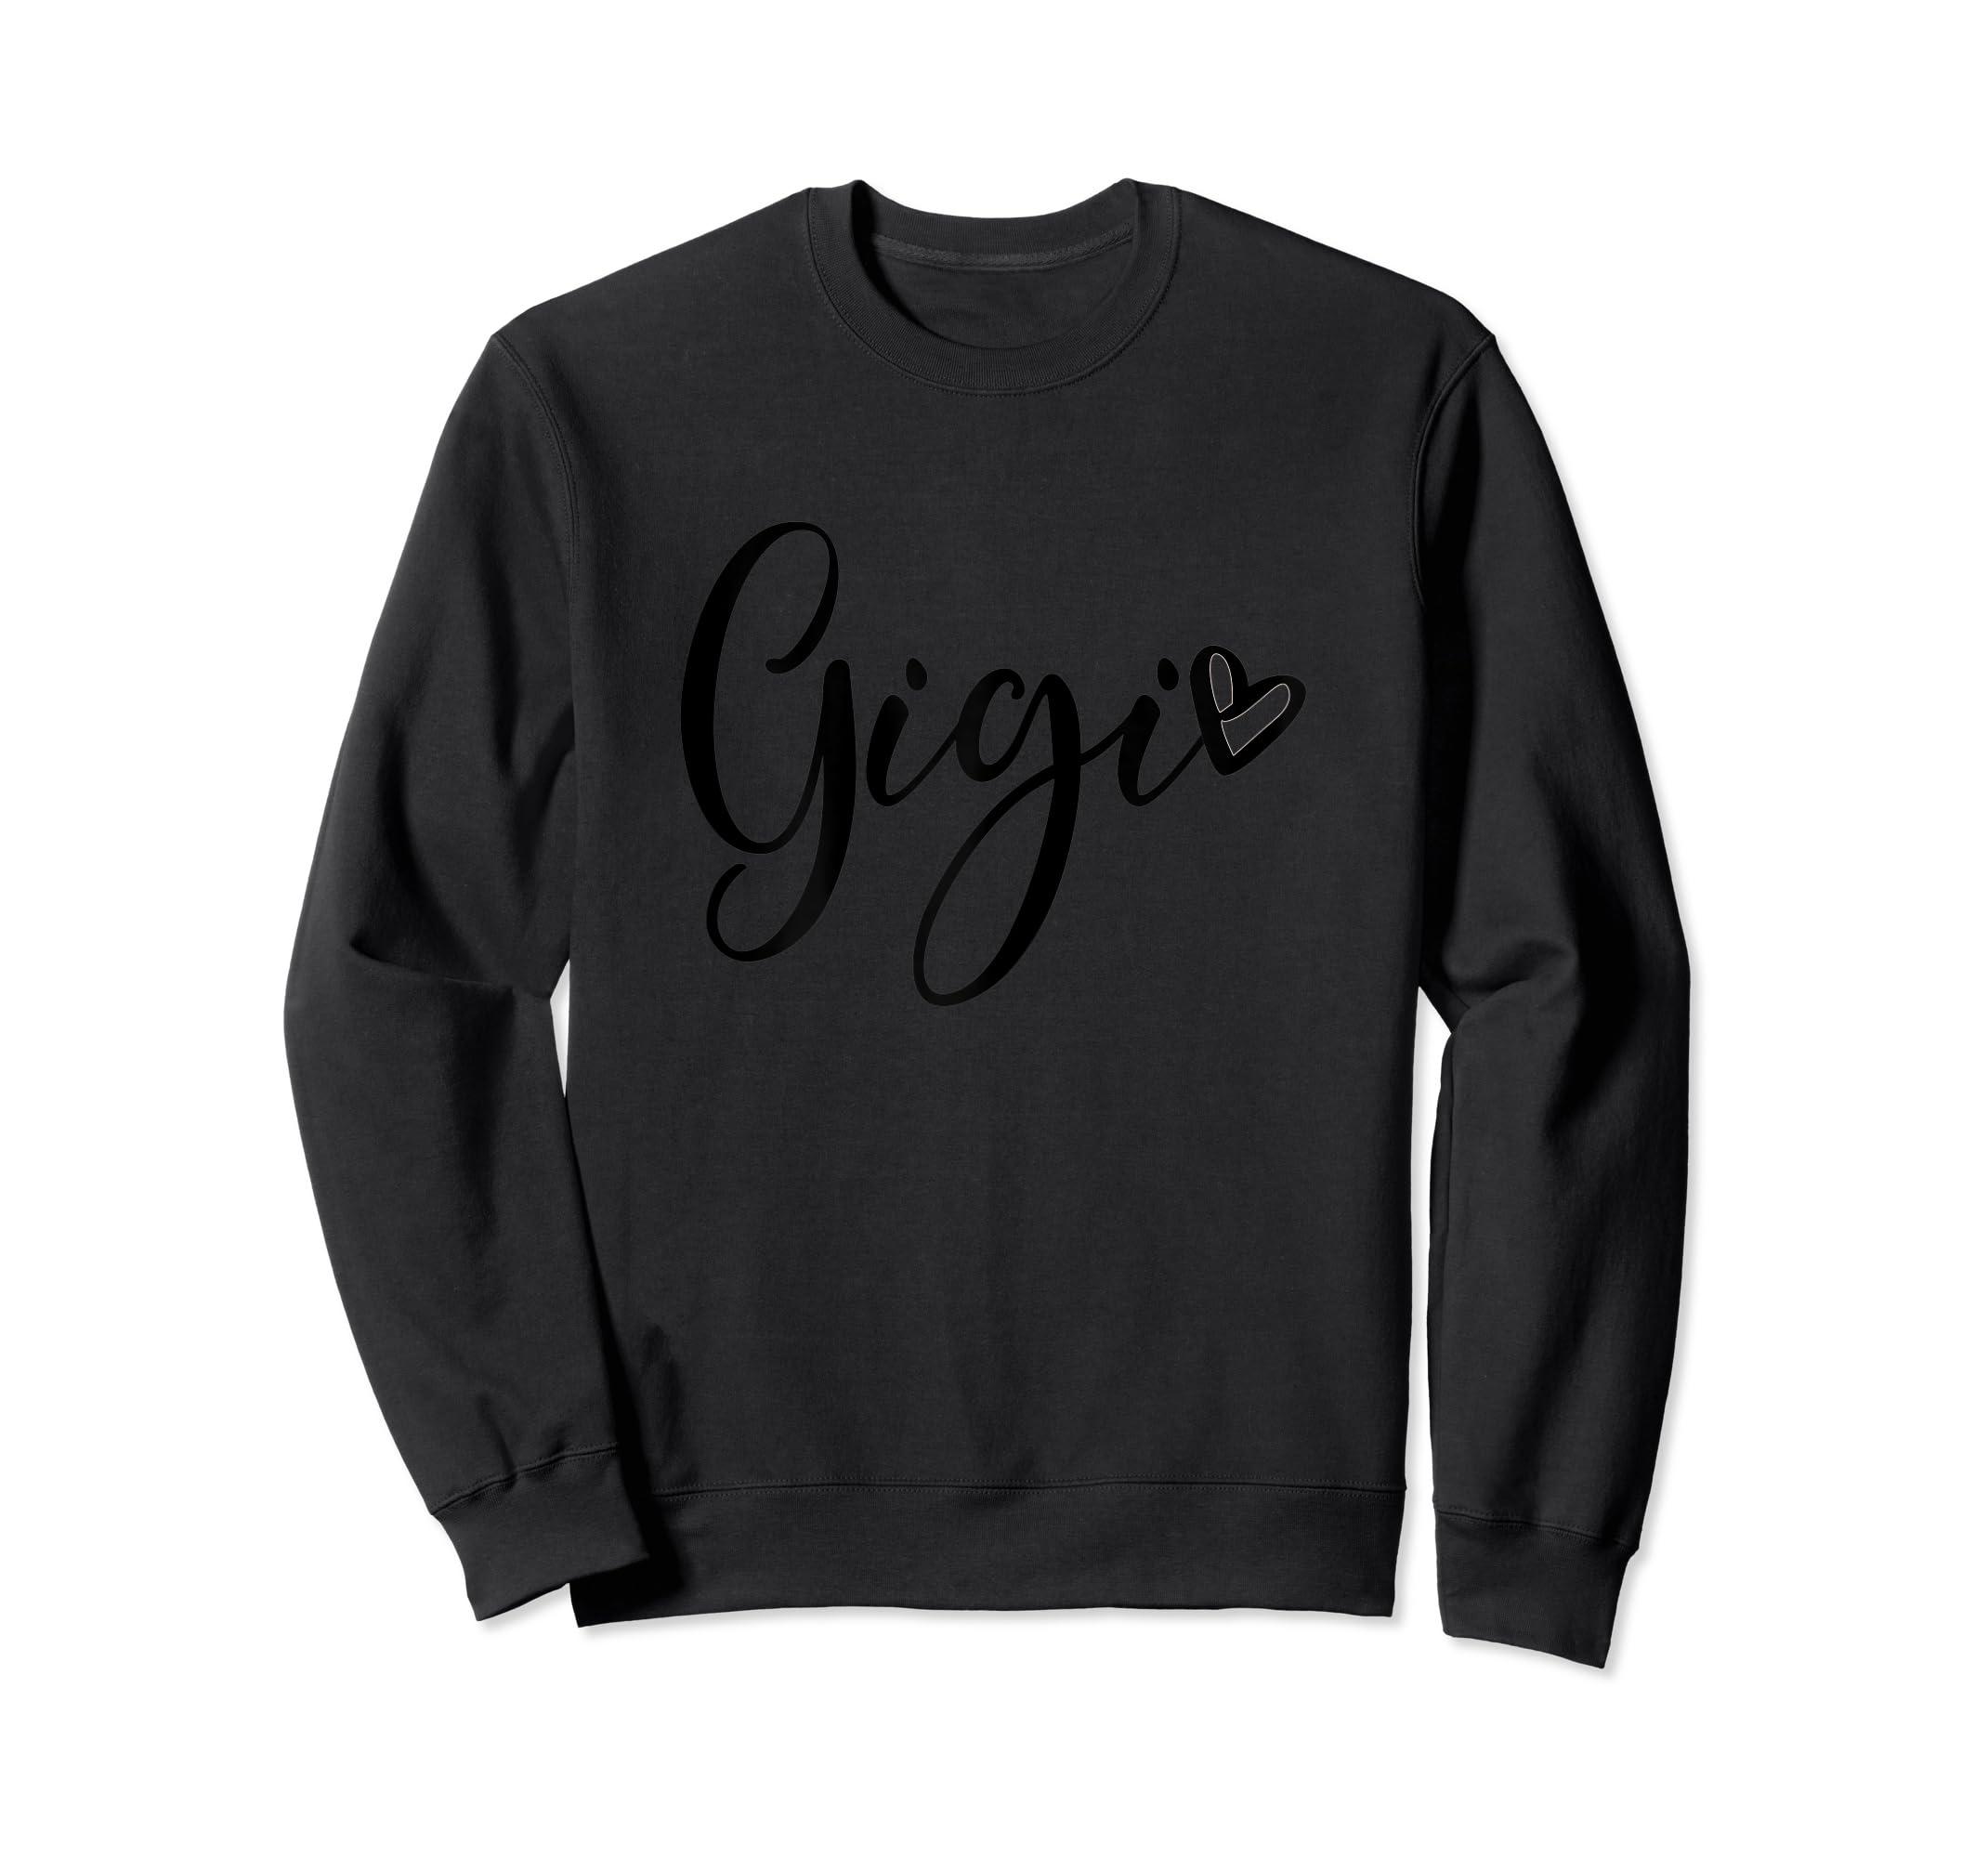 Womens Gigi Grandma T Shirt Pregnancy Announcement Mother's Day-Sweatshirt-Black